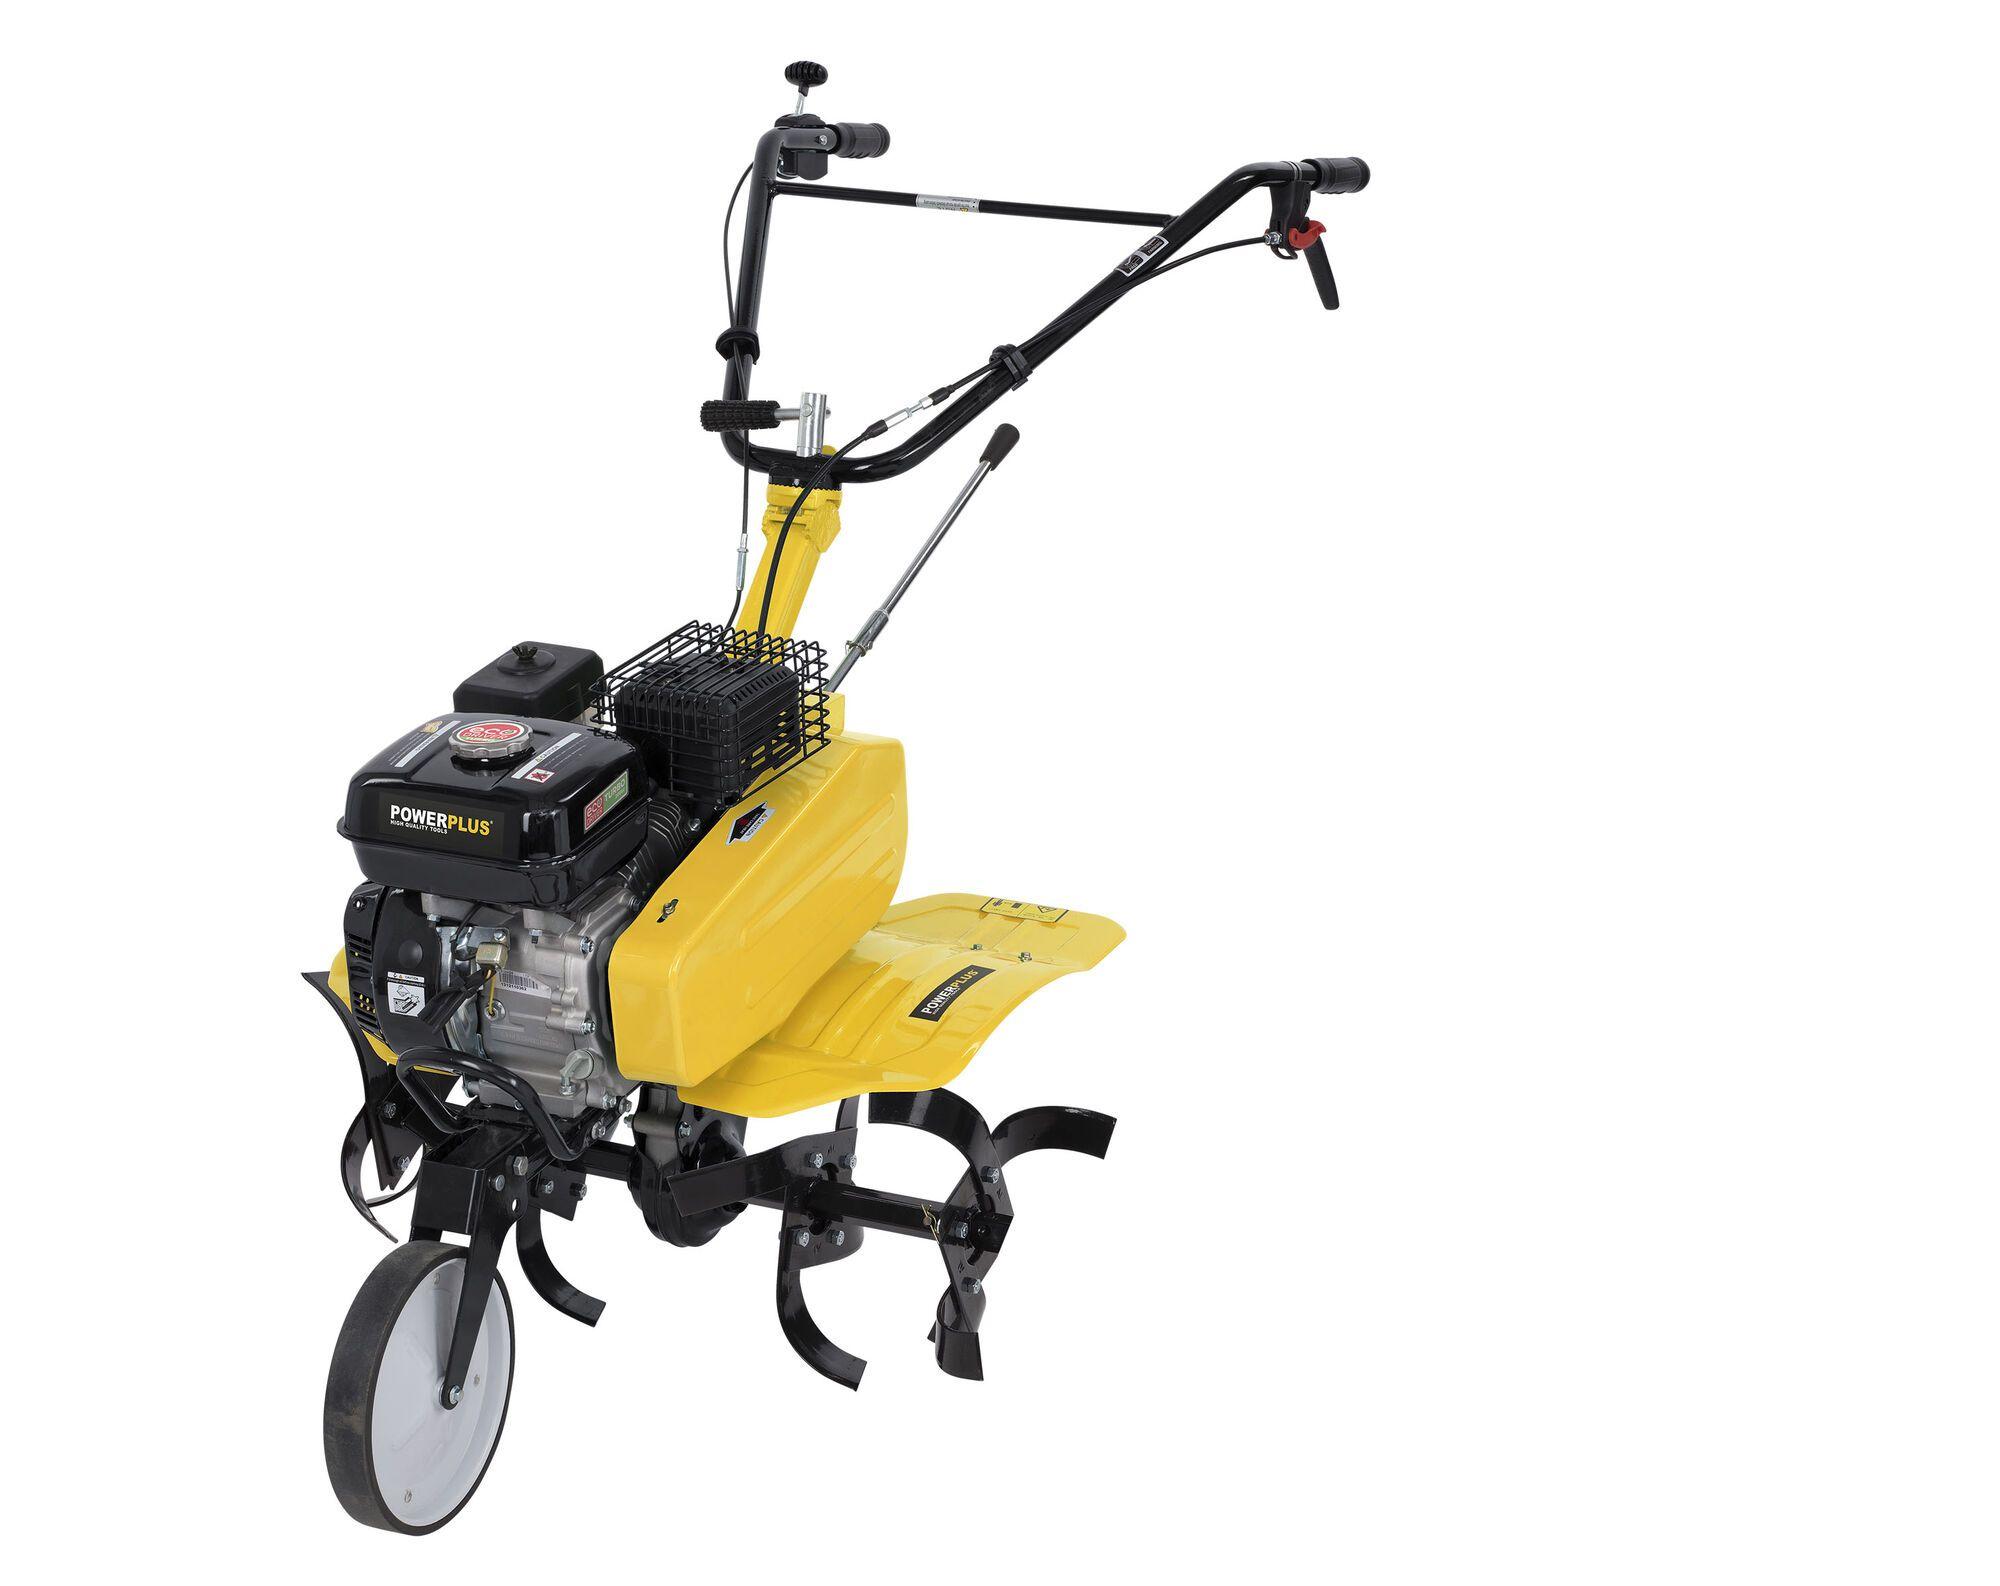 Powerplus POWXG7217 Benzine tuinfrees met ploeg 208cc | Cultivator met ploeg 105cm